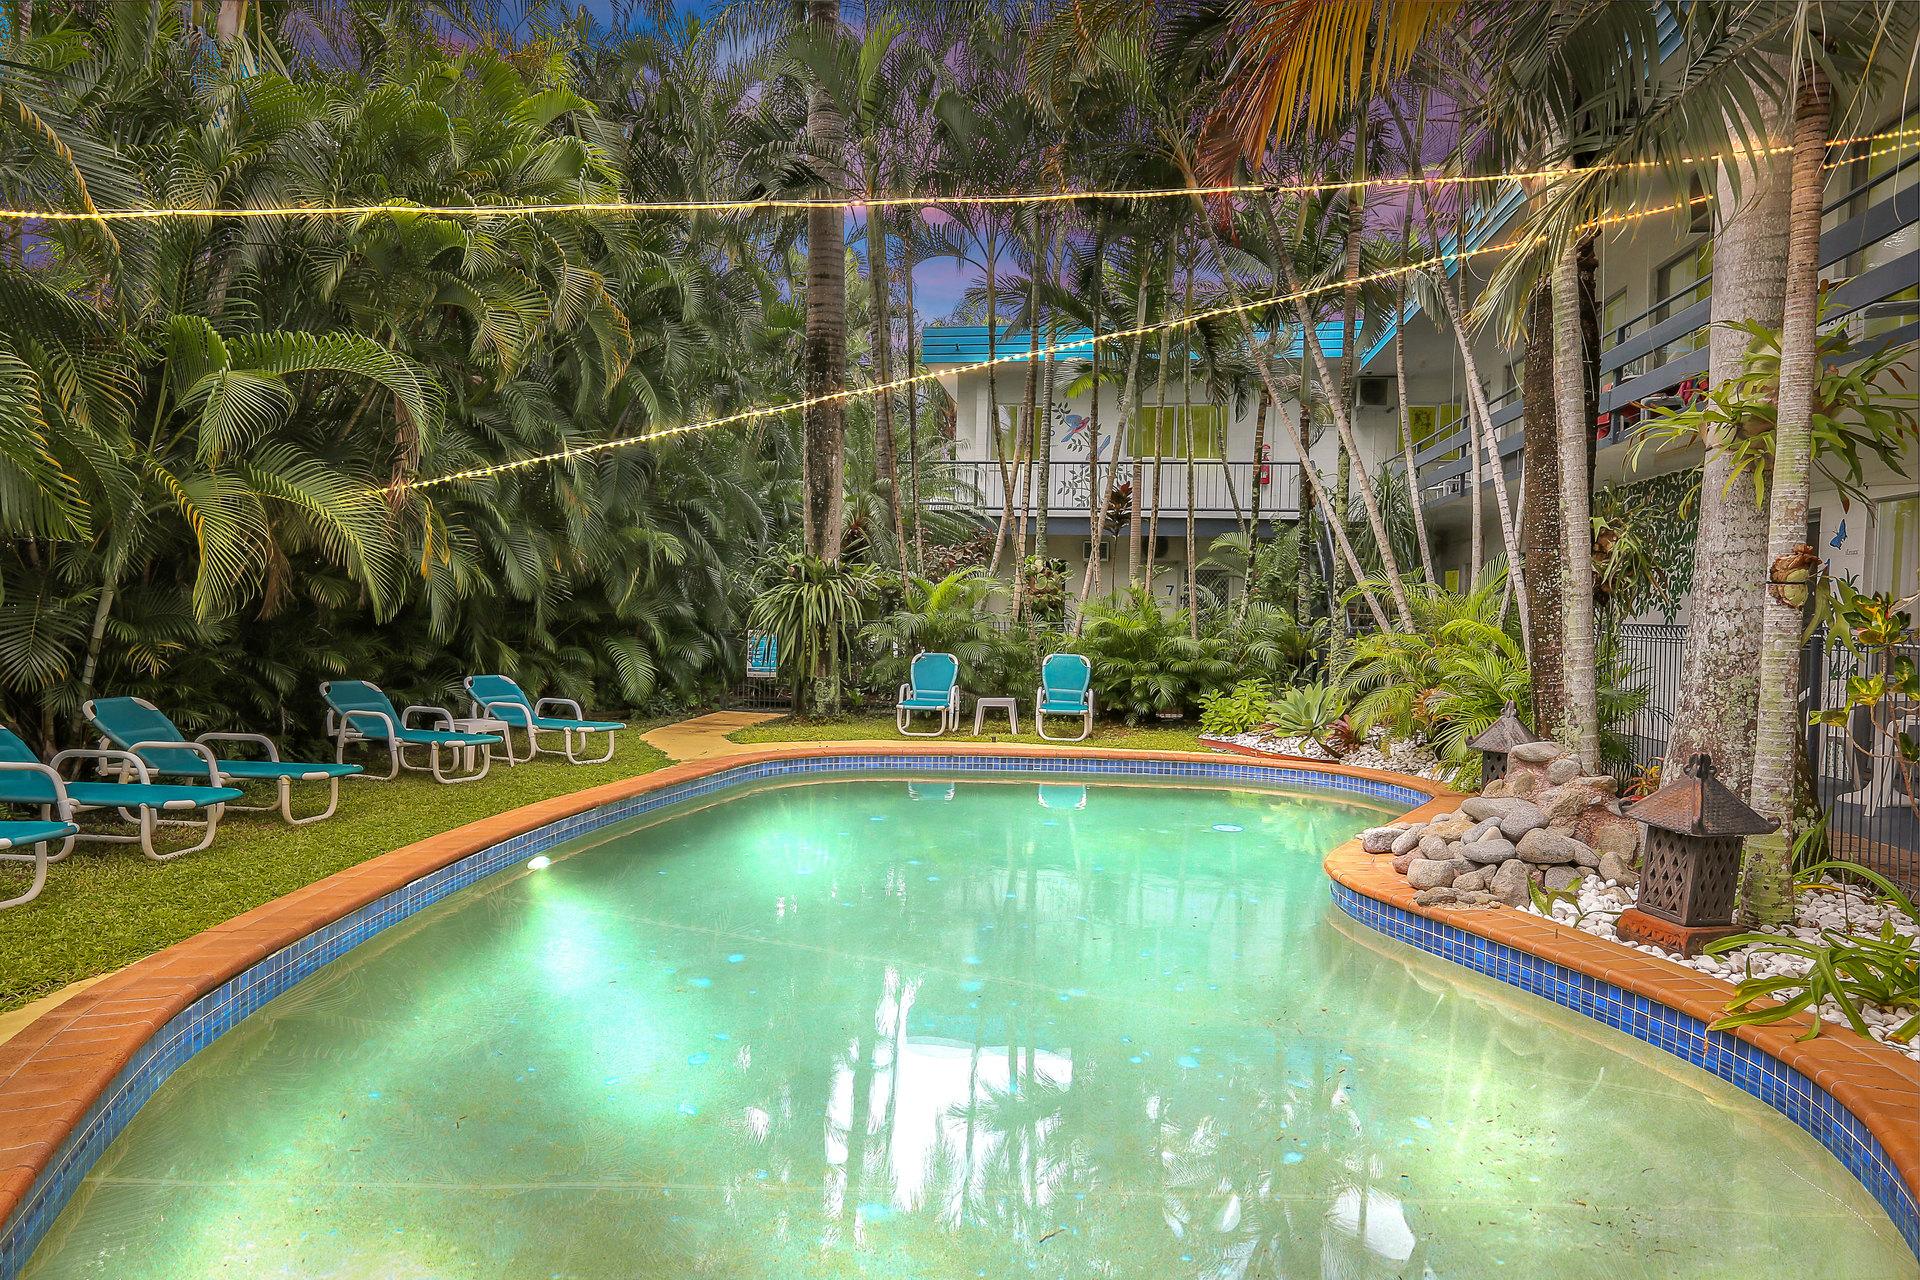 e - The Palms at Palm Cove